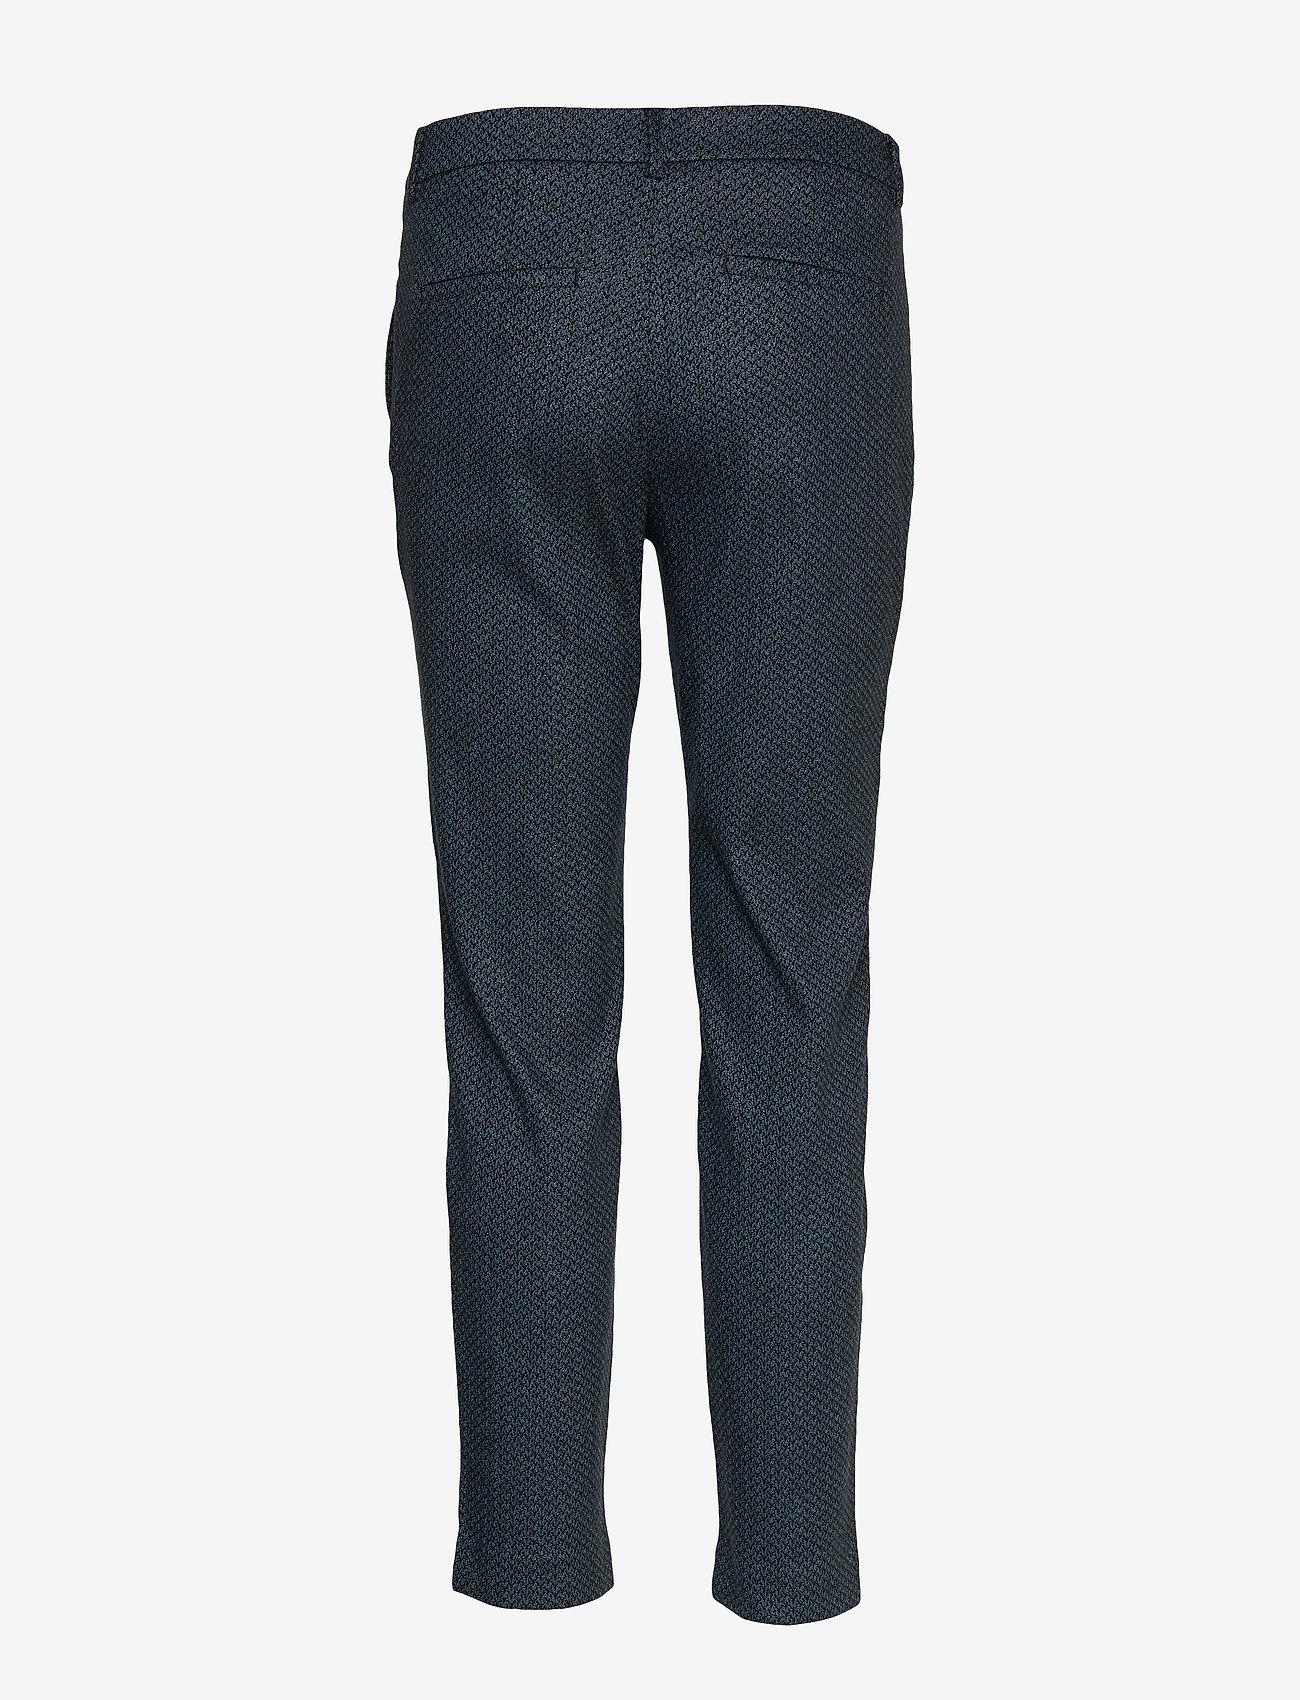 FIVEUNITS - Kylie 617 Crop - pantalons droits - navy dawny - 1